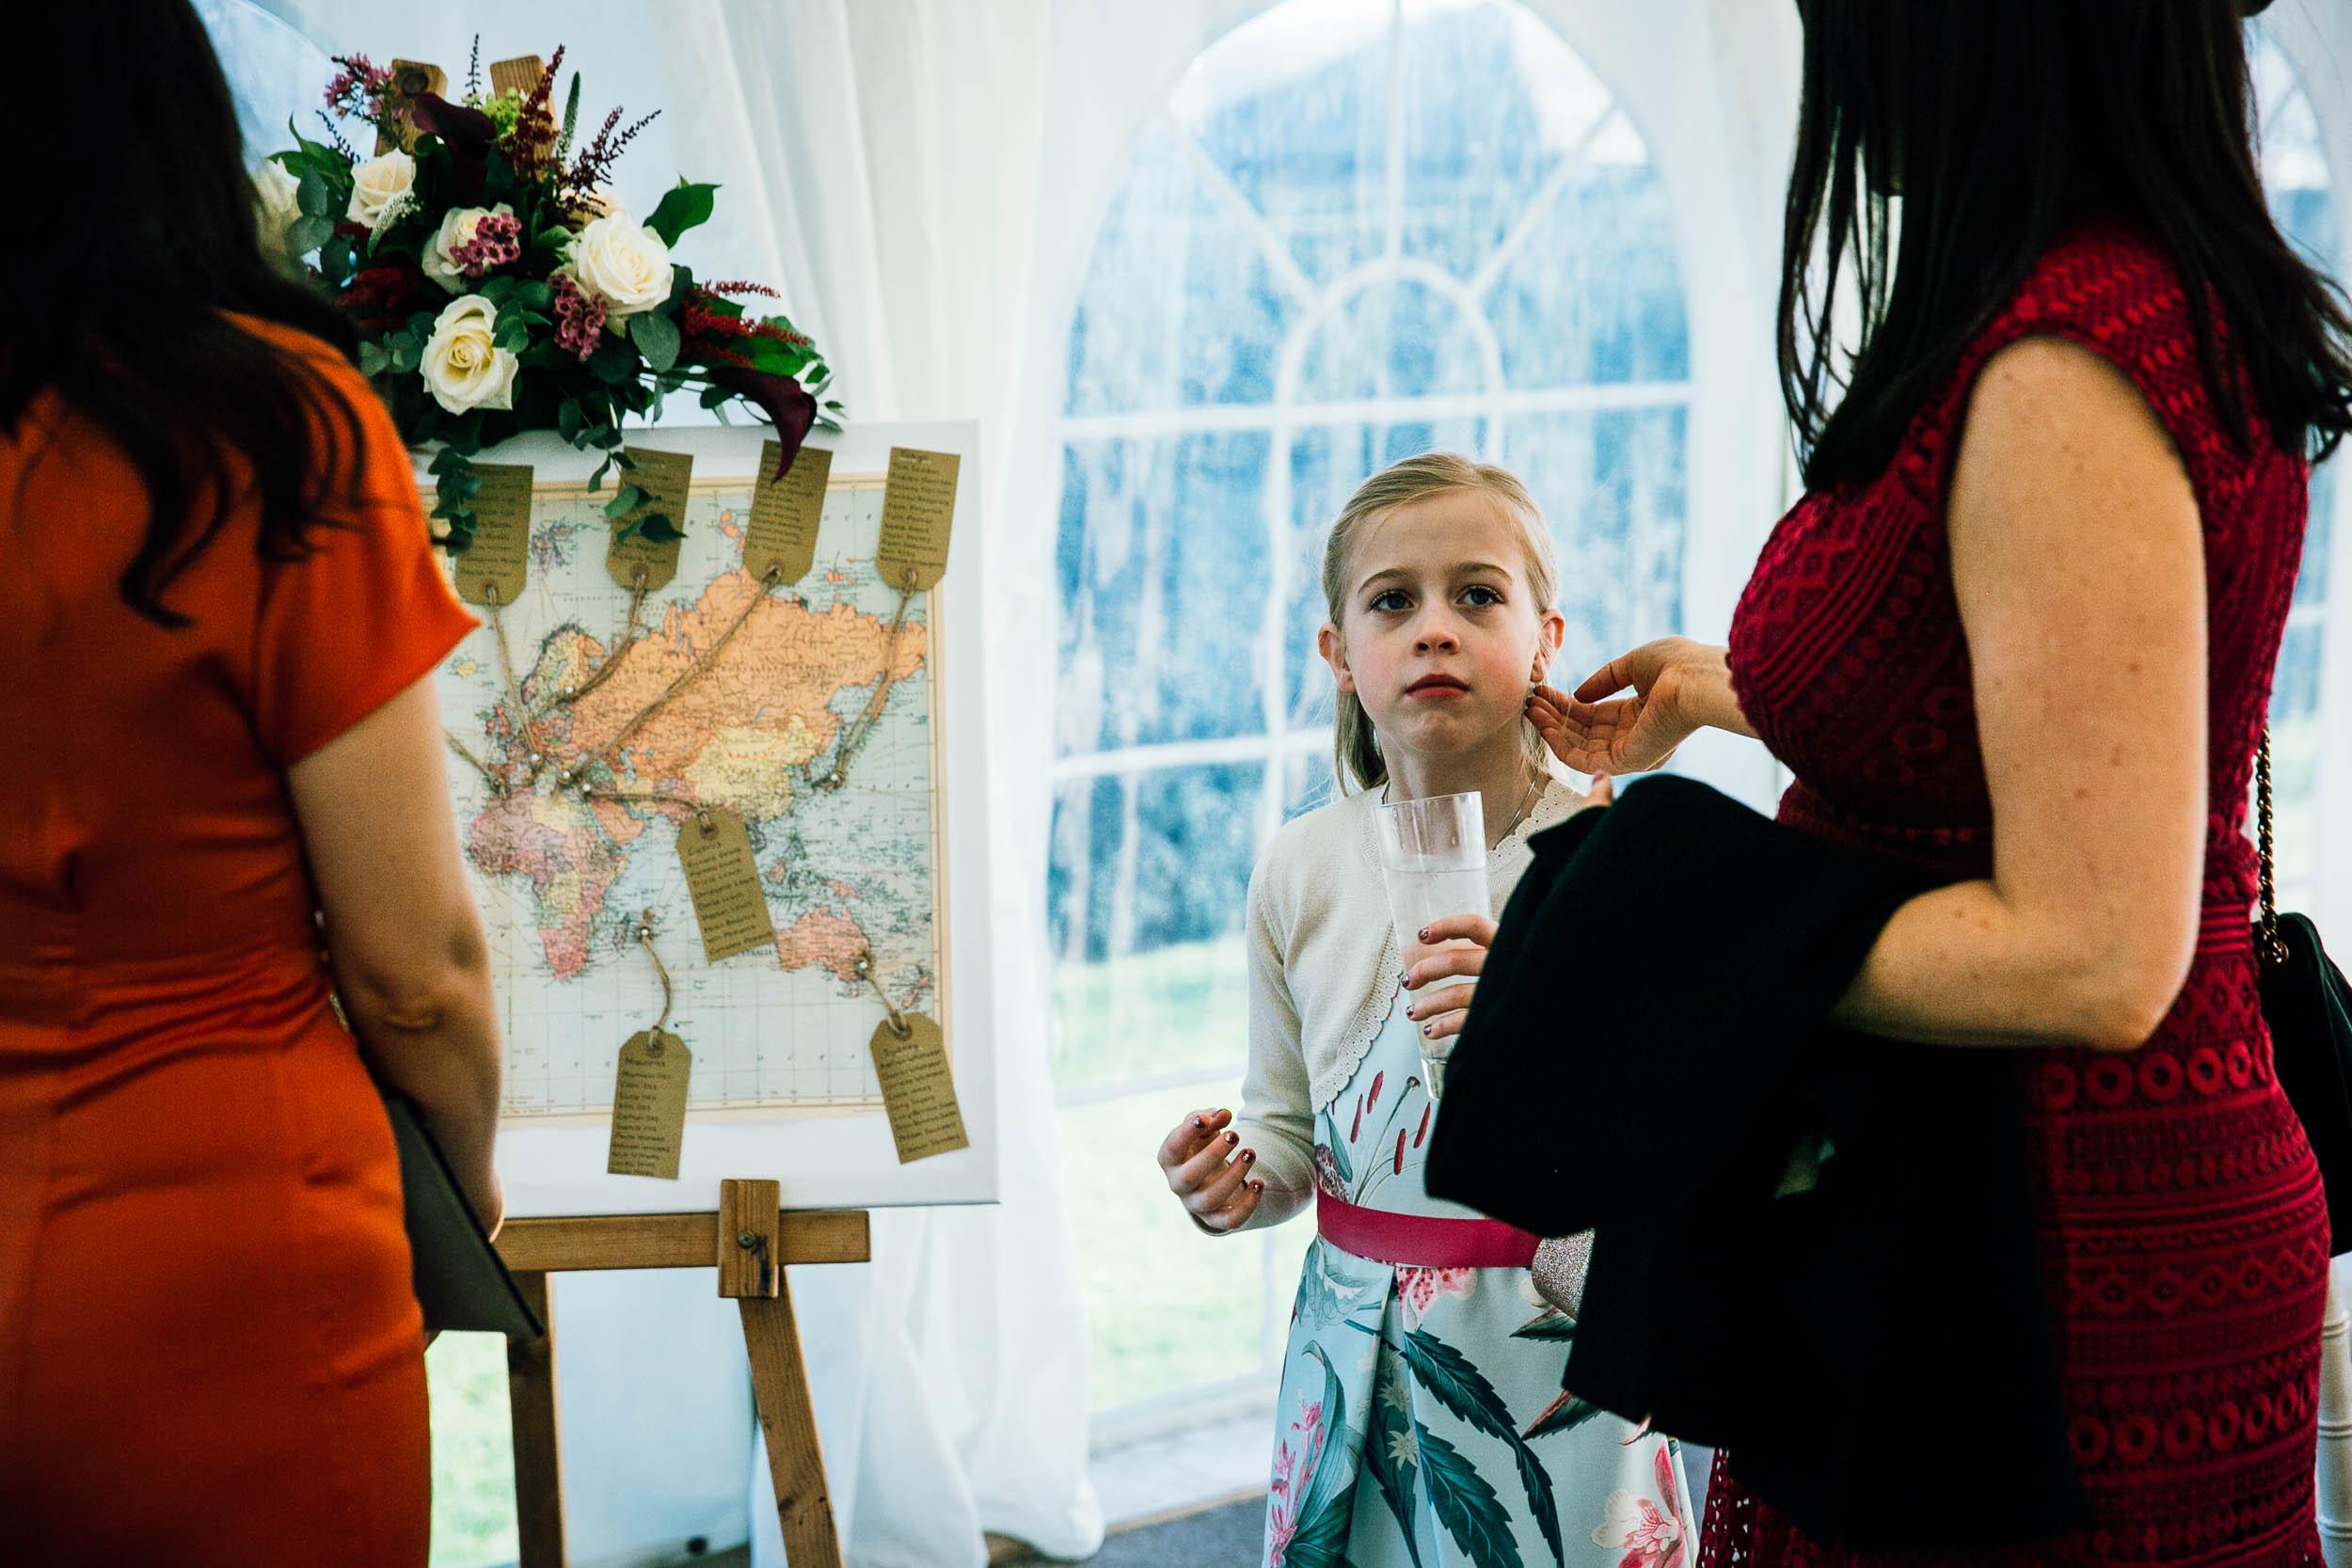 micklefield-hall-wedding-photographer 052.jpg